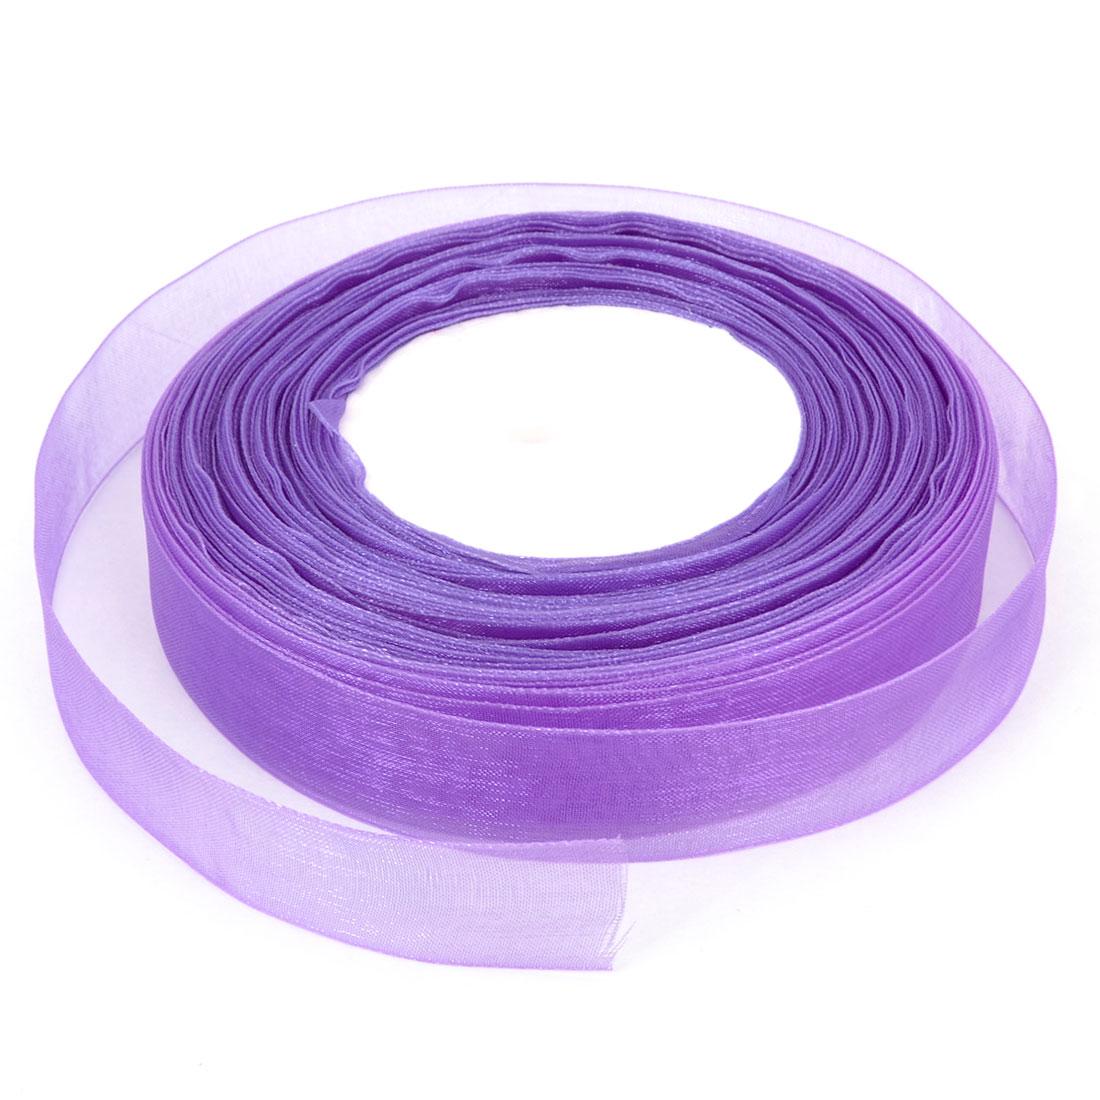 50 Yard 20mm Sheer Organza Ribbon Roll Tape Royal Purple for Gift Wrapping DIY Craft Bridal Detail